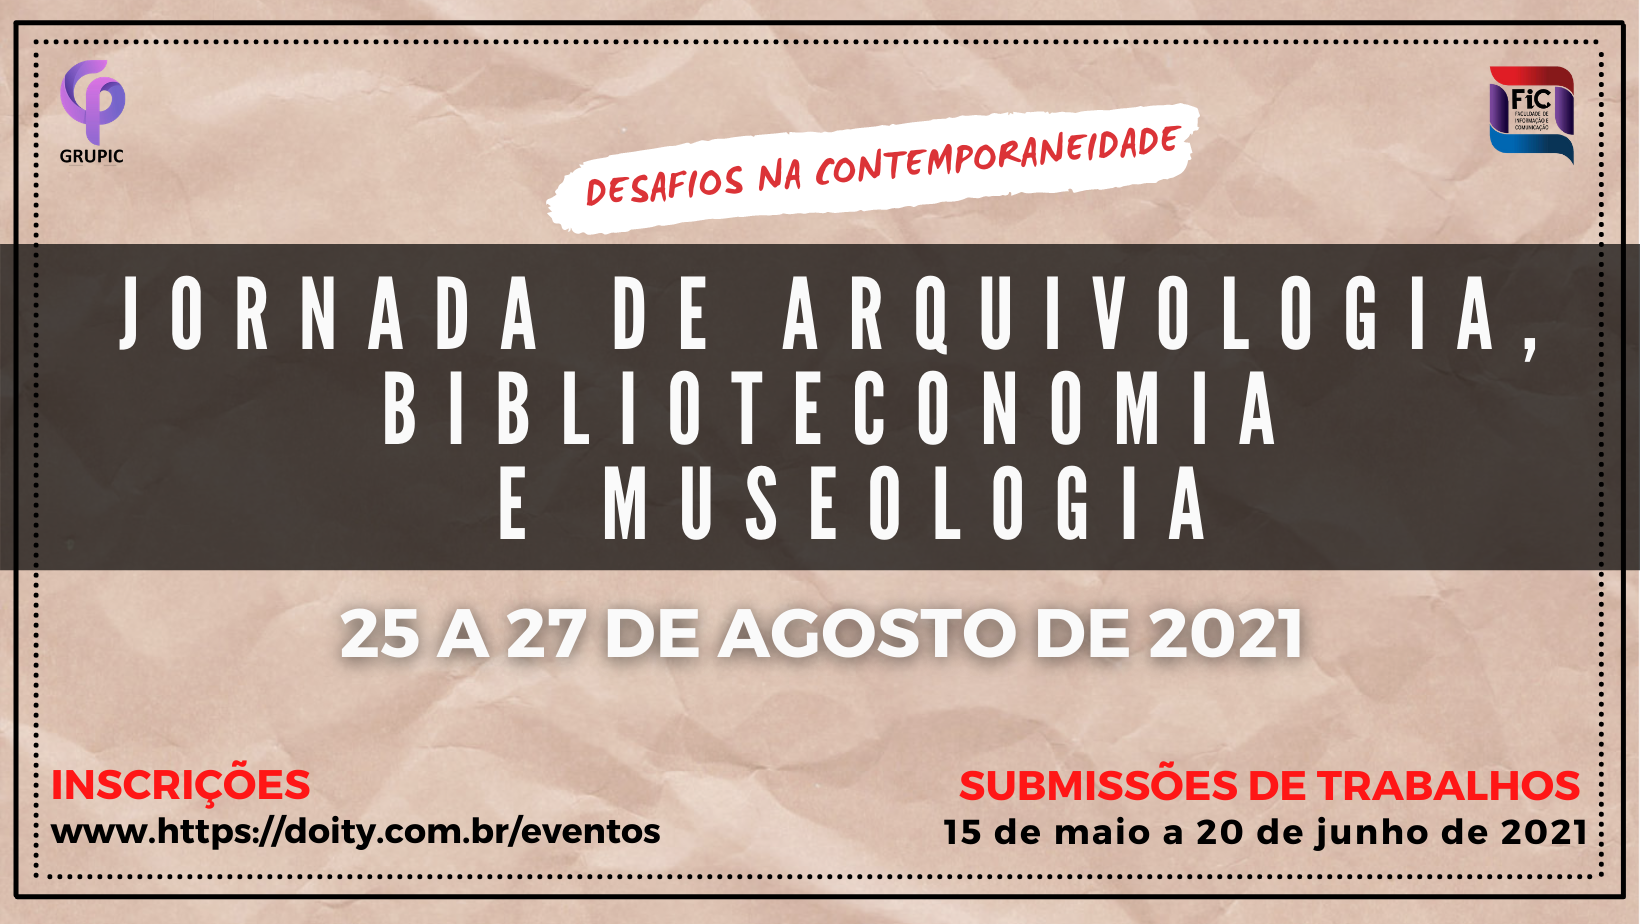 I Jornada de Arquivologia, Biblioteconomia e Museologia - JABIM